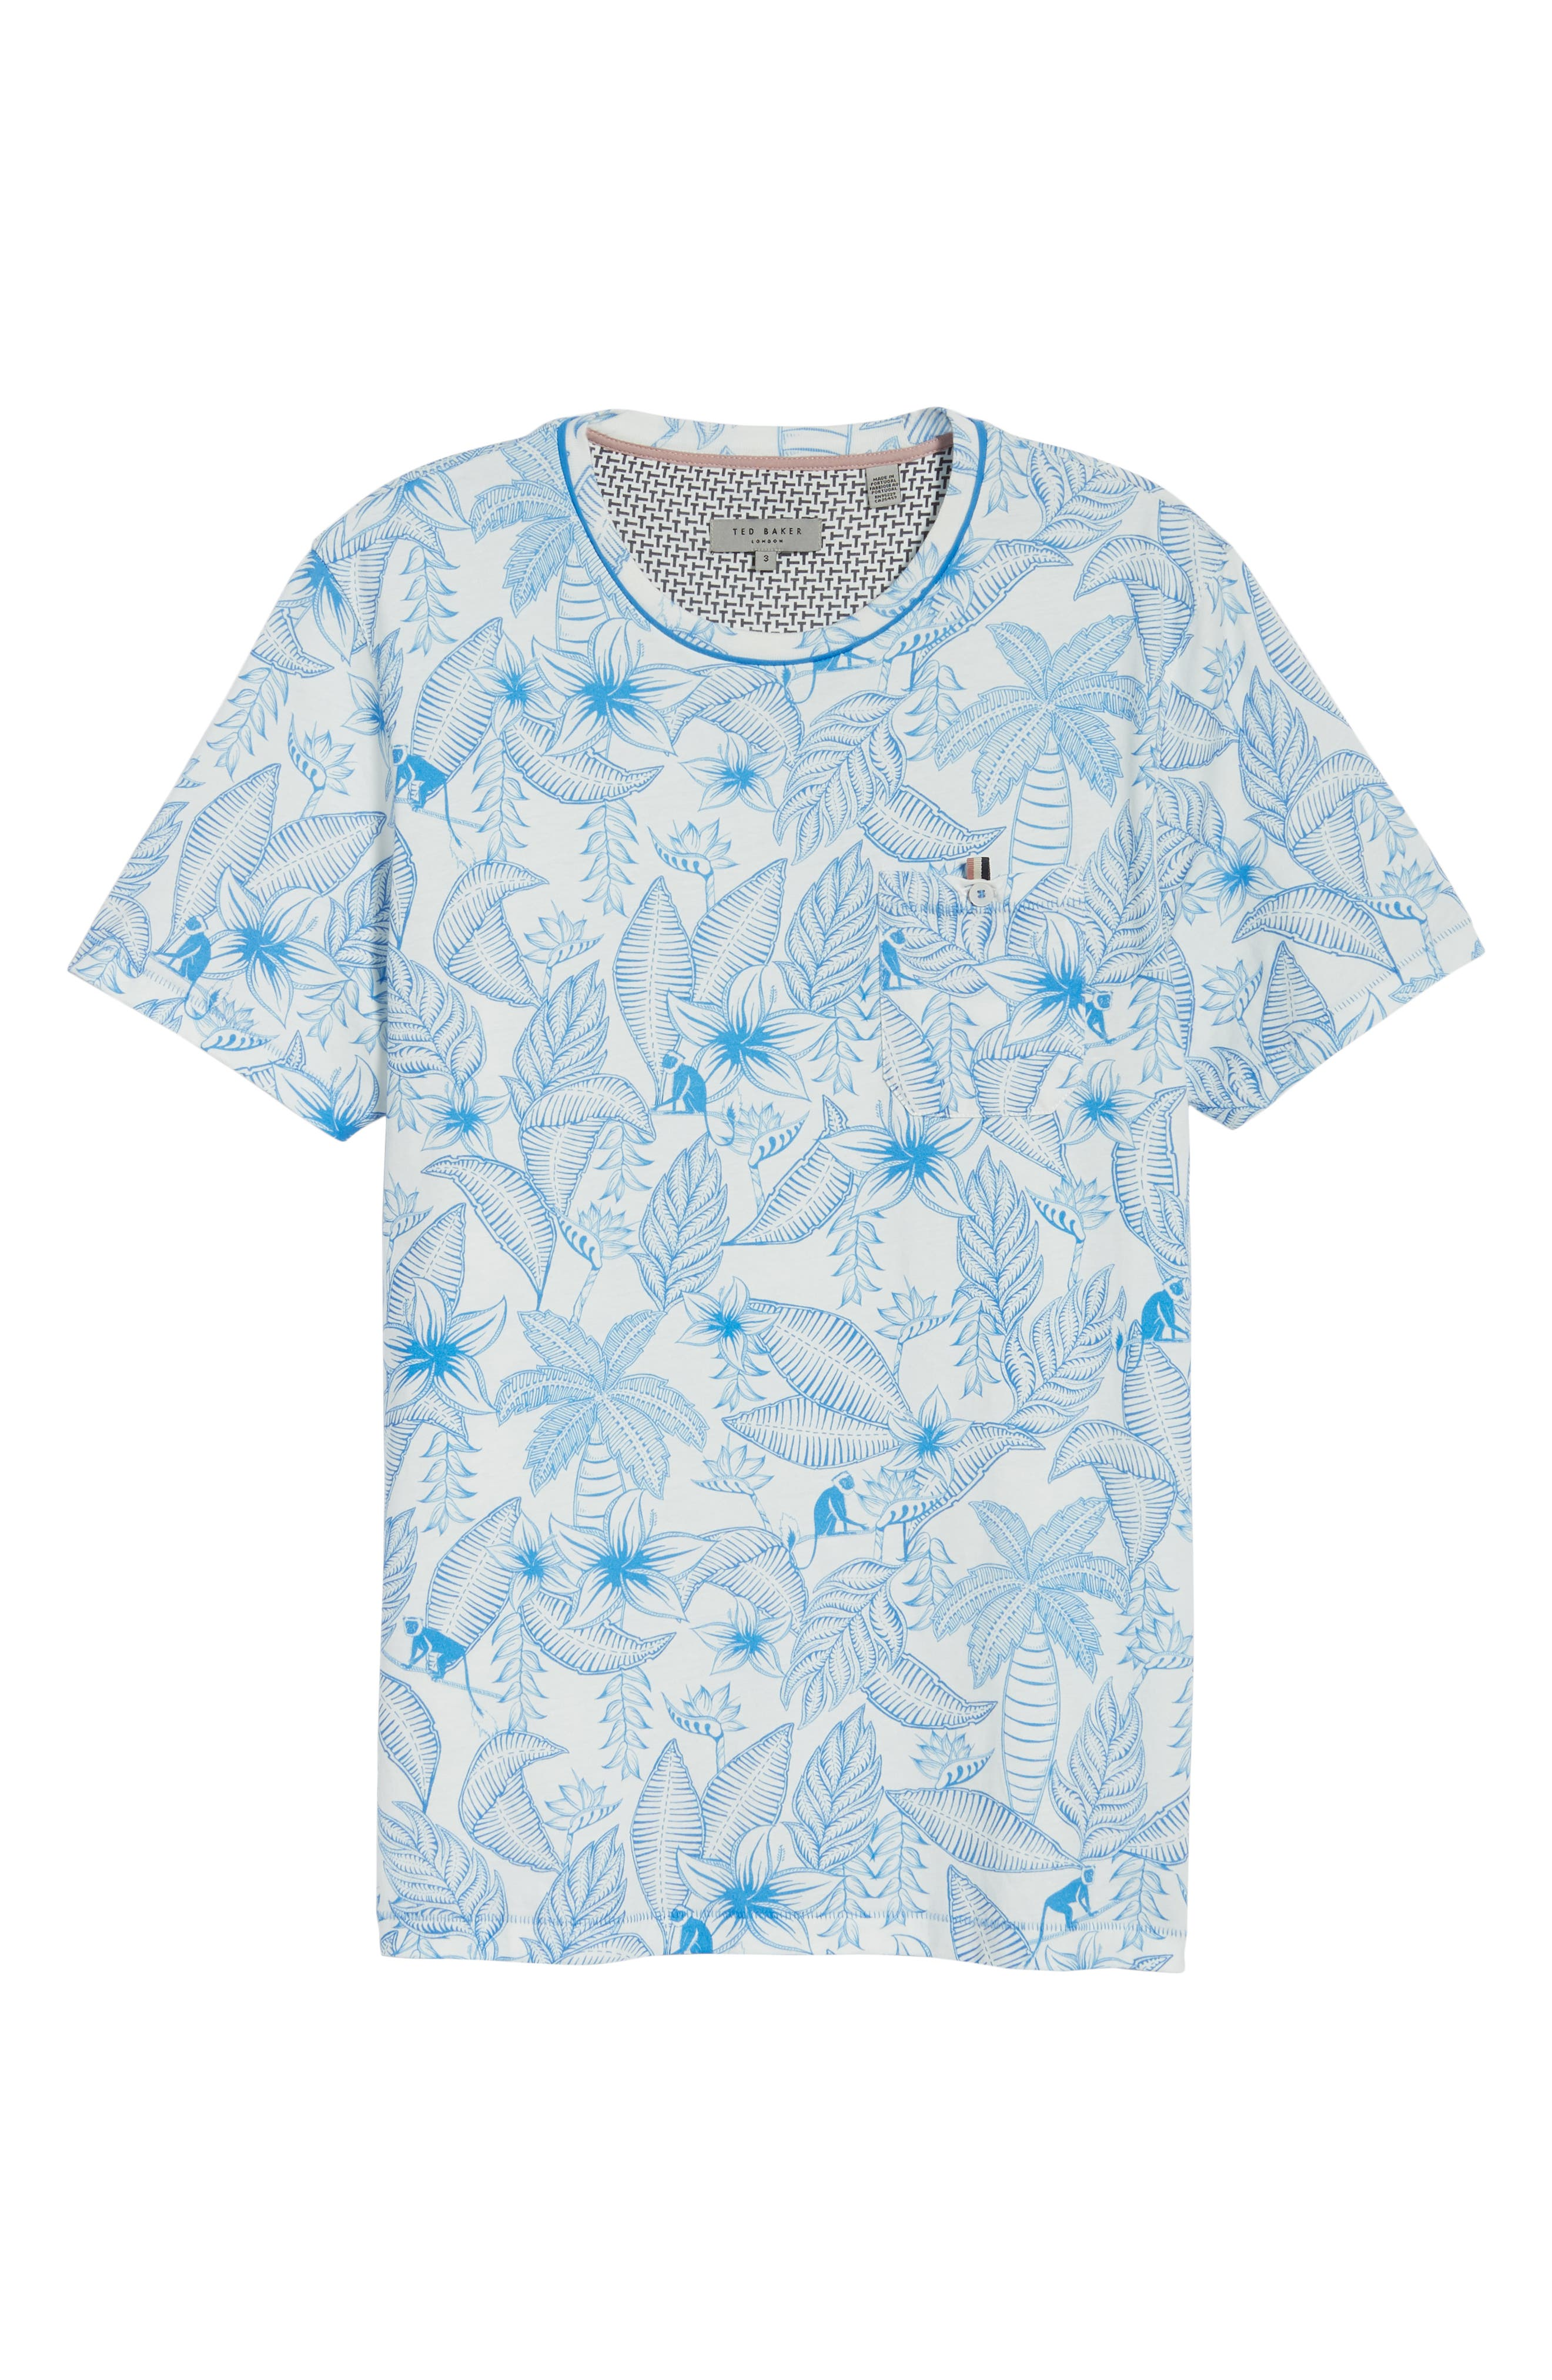 Bengel Crewneck T-Shirt,                             Alternate thumbnail 6, color,                             BRIGHT BLUE